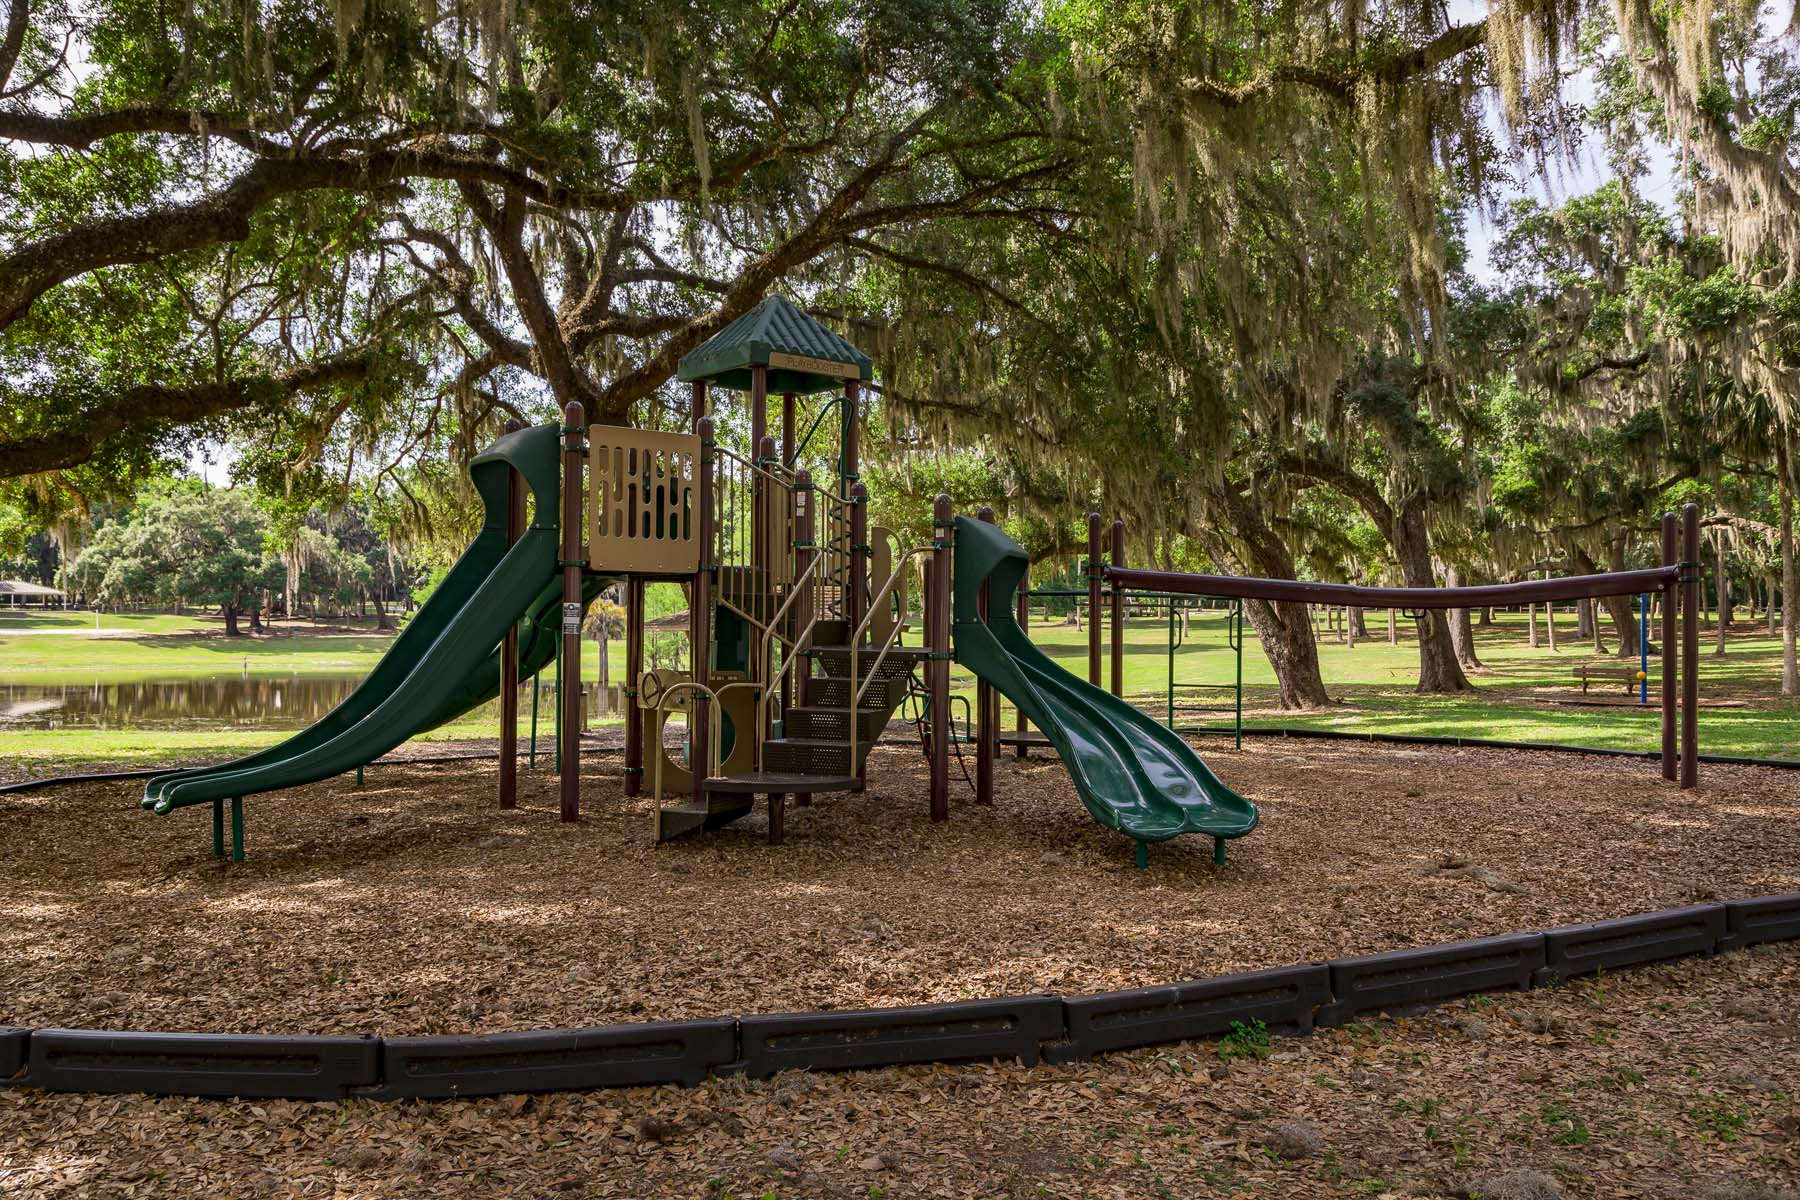 Magnolia Park Playground